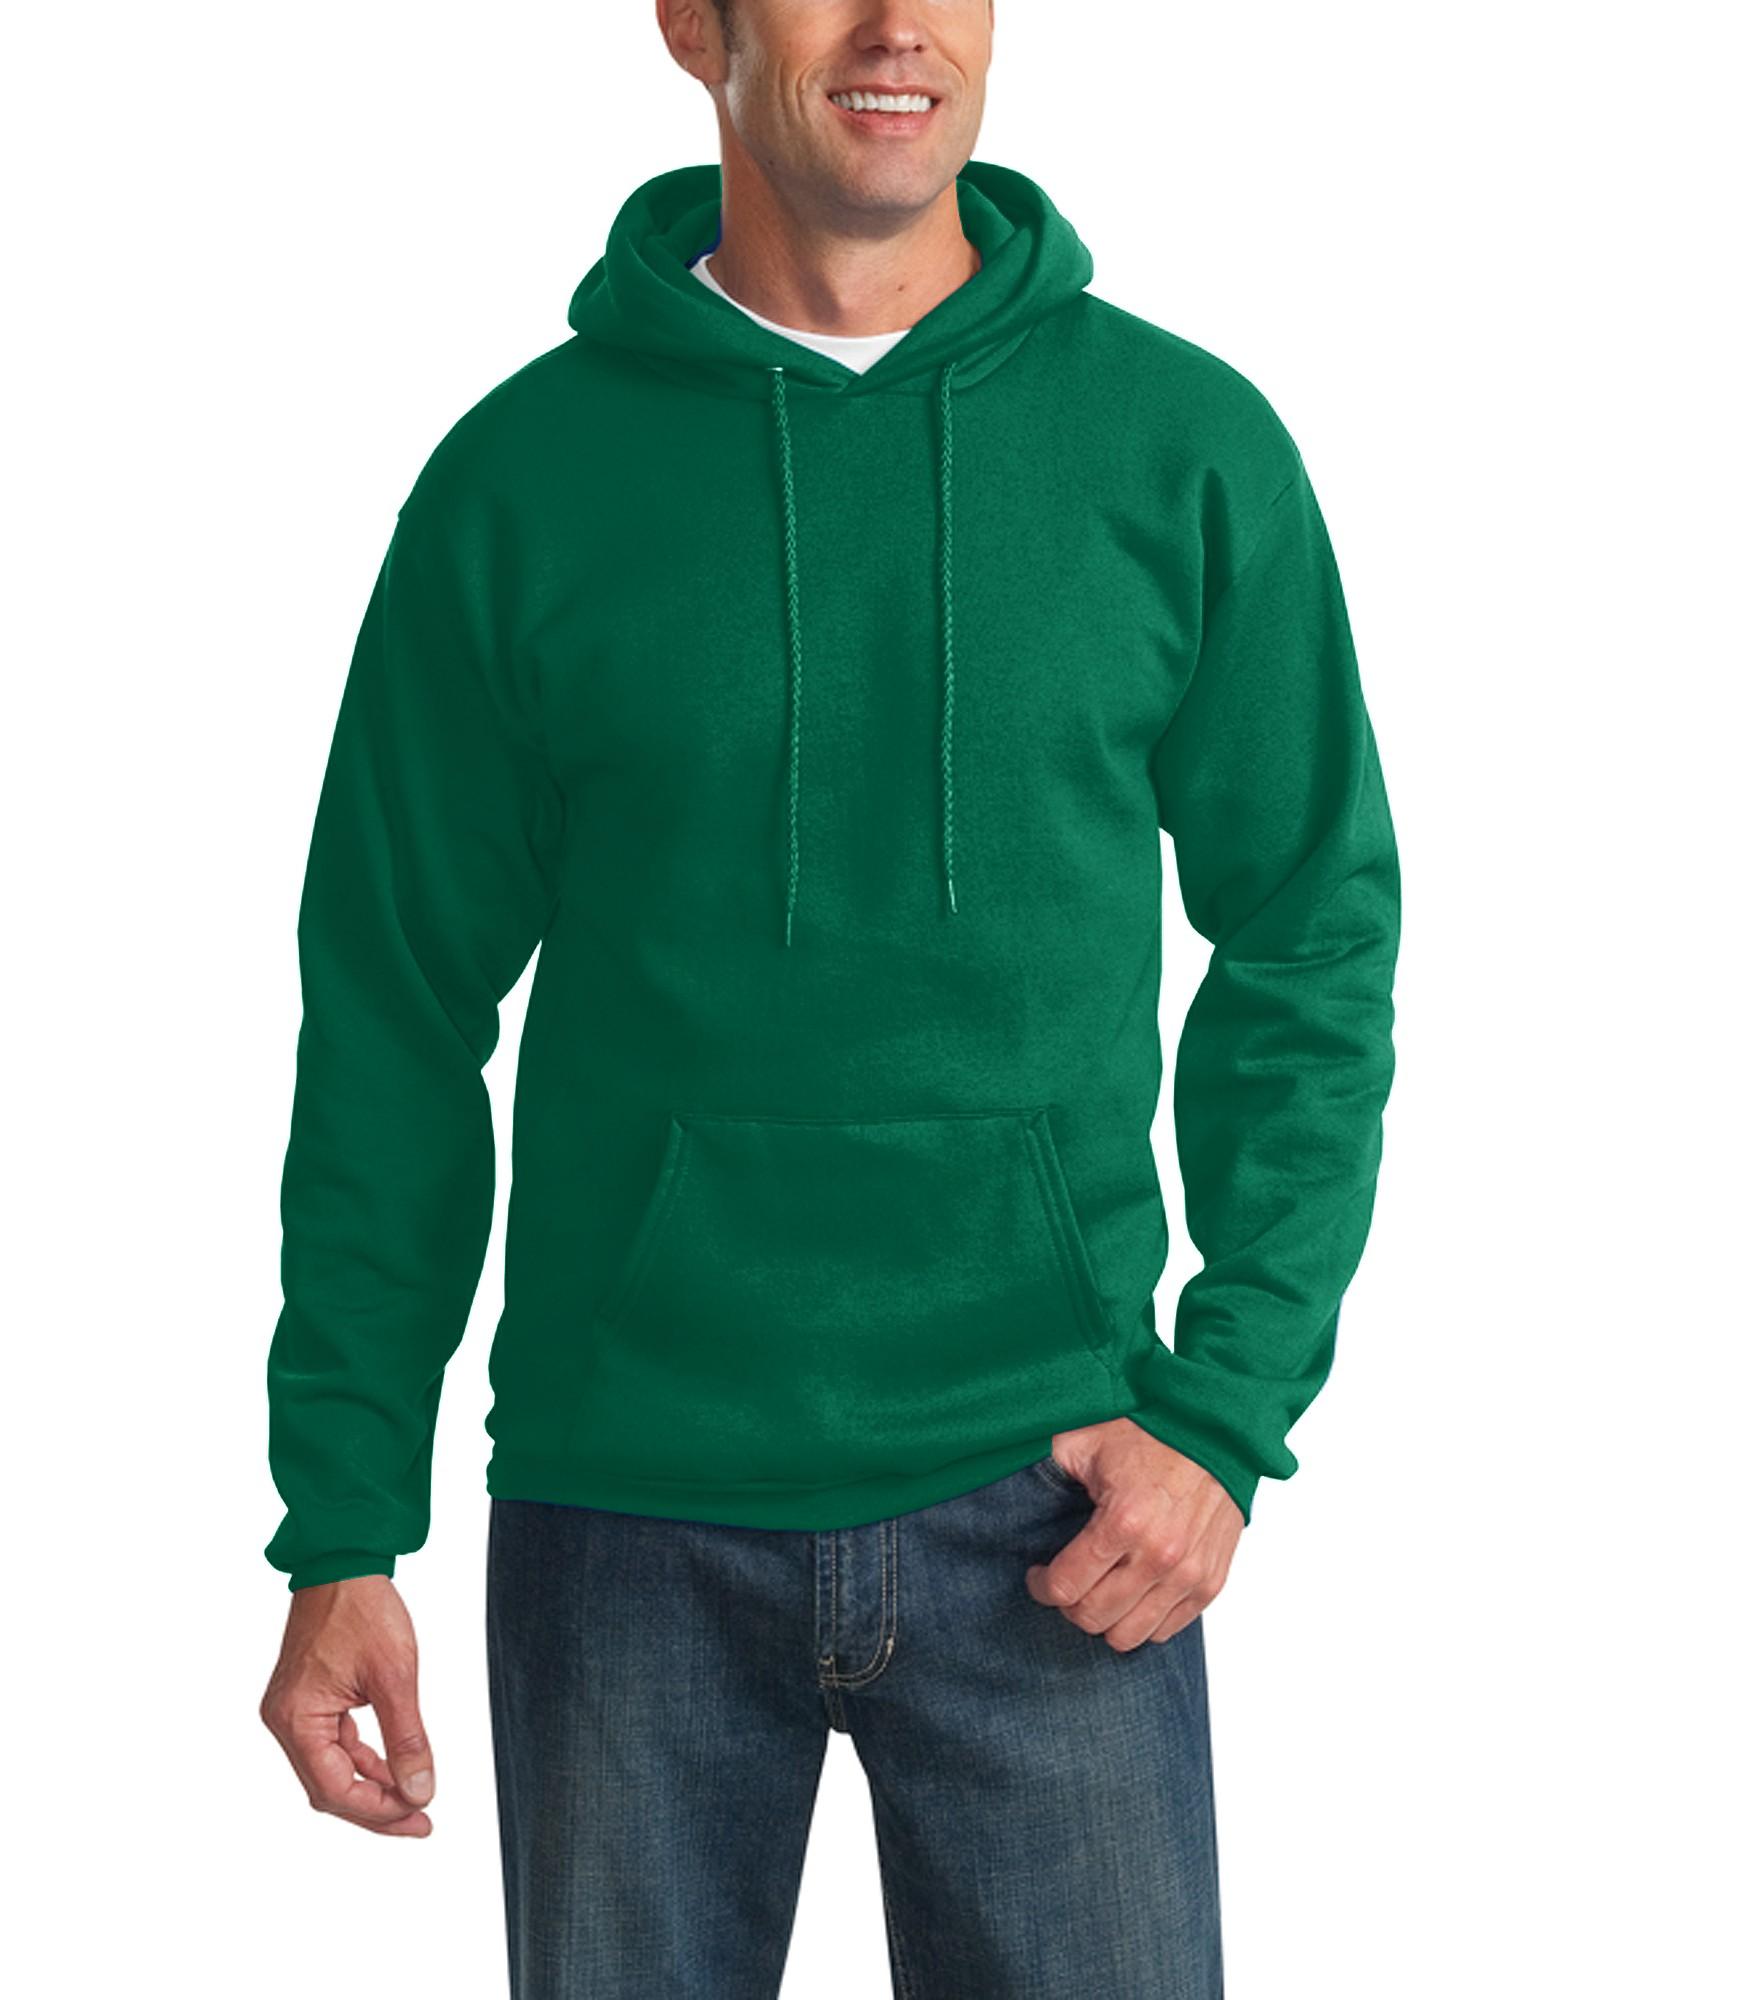 PC78H-Light Blue Port /& Company-Classic Pullover Hooded Sweatshirt